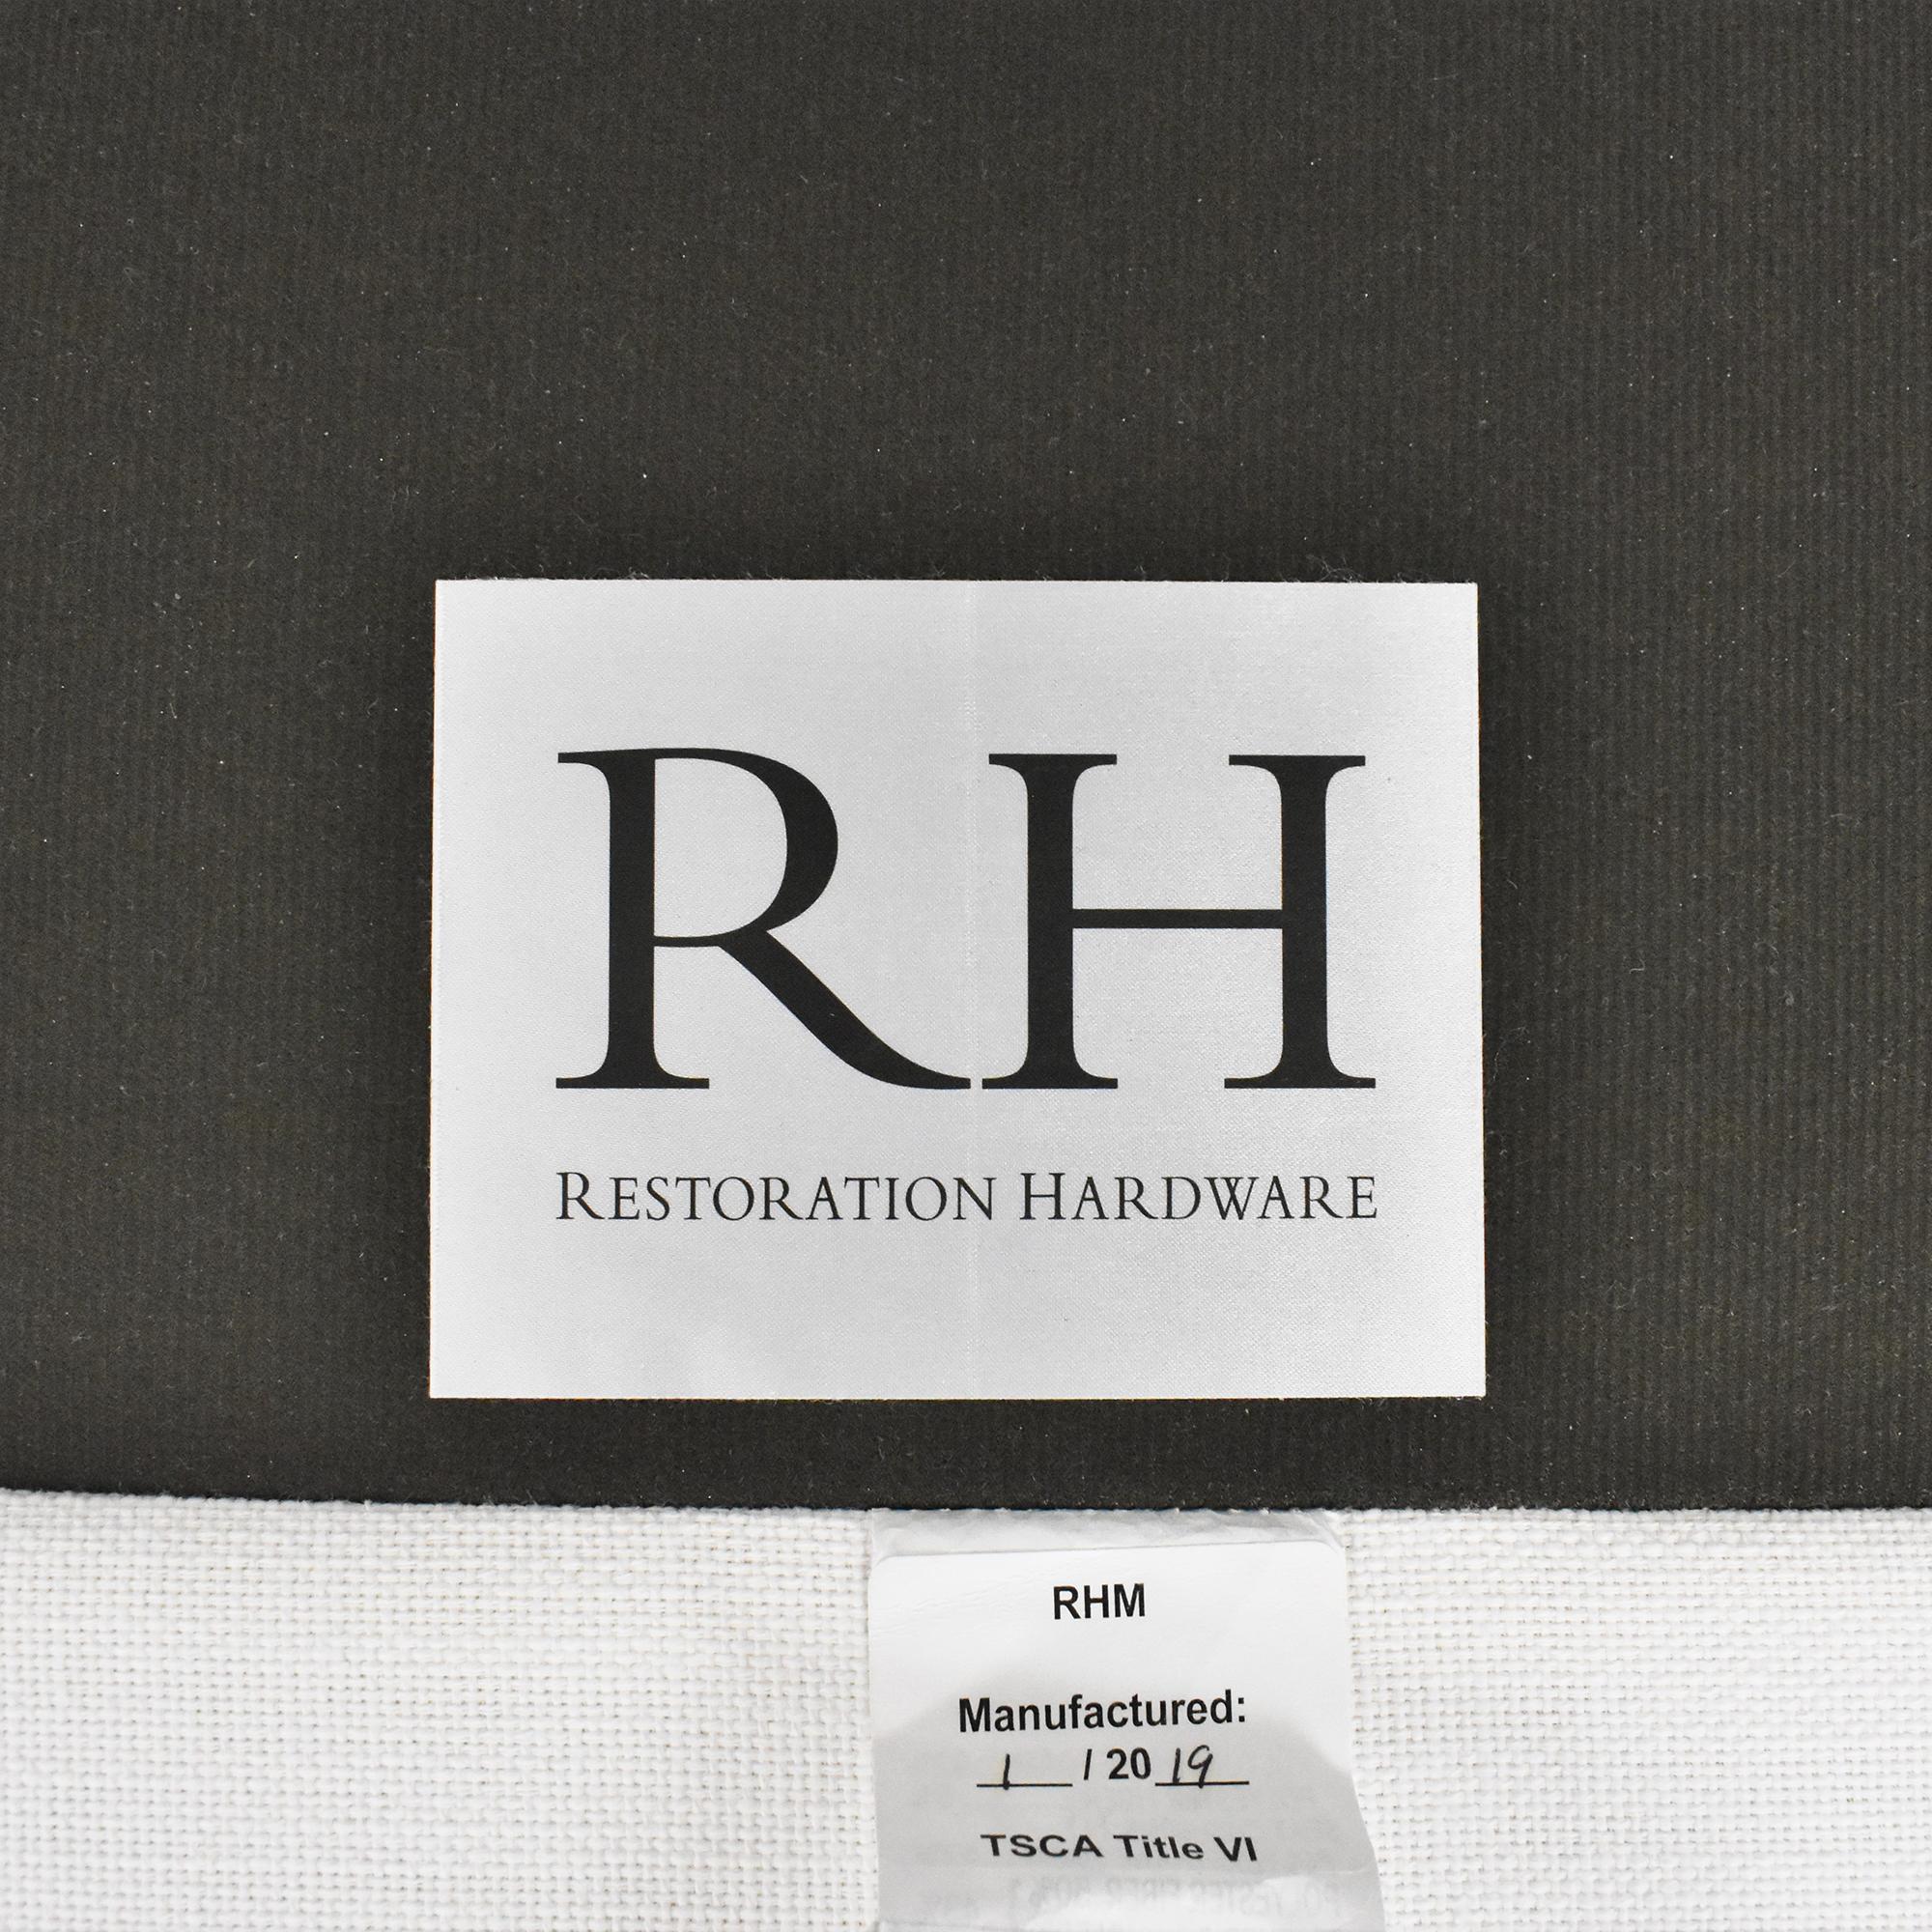 Restoration Hardware Maddox Modular Sofa / Sectionals